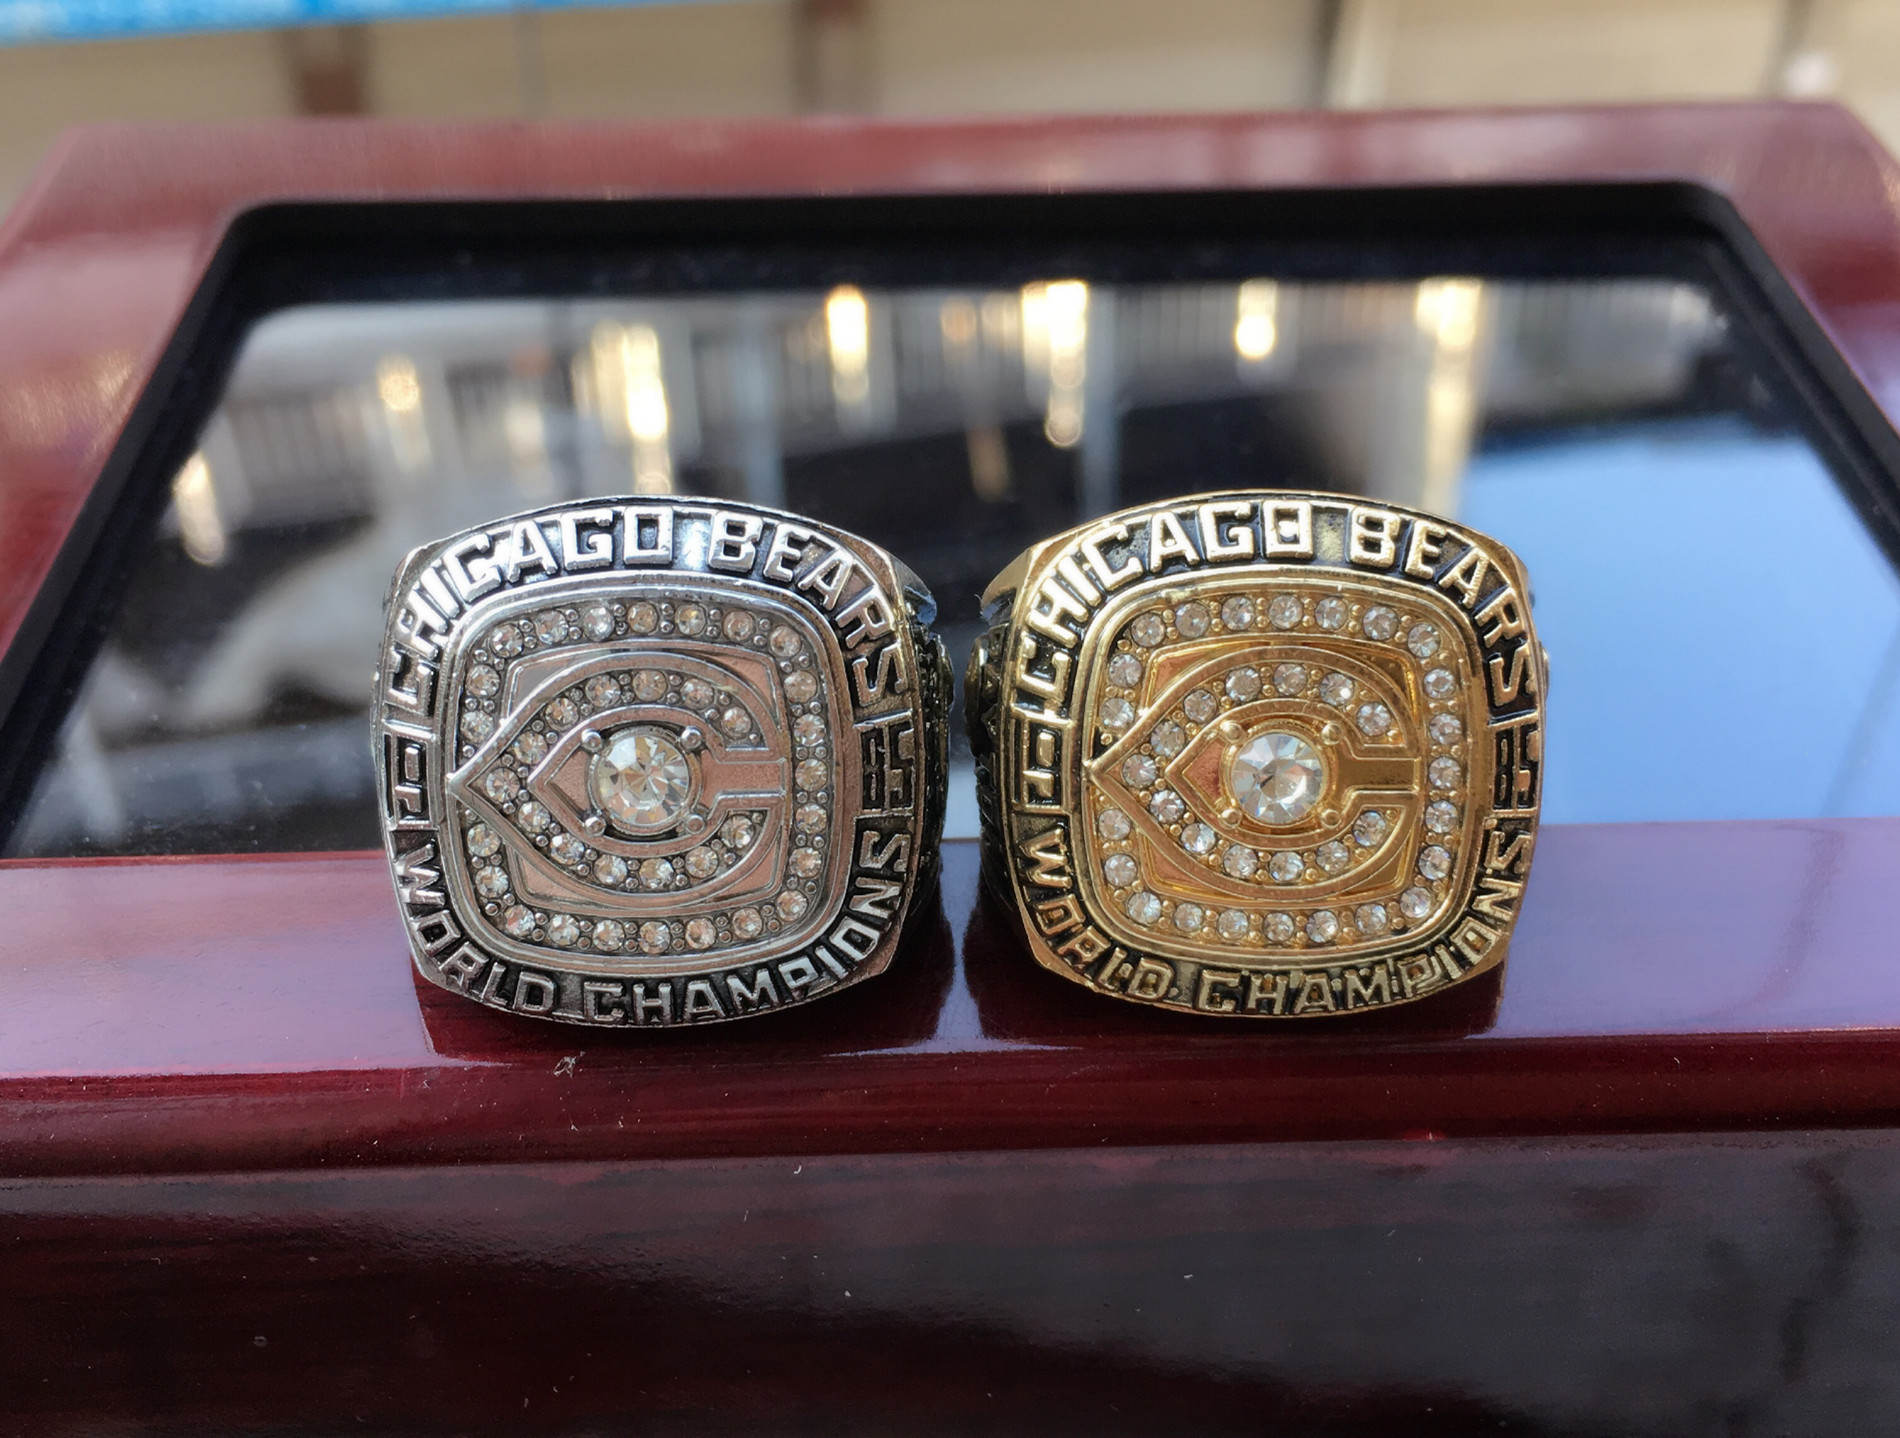 CHICAGO (2pcs) 1985 1985 BEARS Championship Ring g Set Men Fan Souvenir Gift Wholesale 2019 Drop Shipping